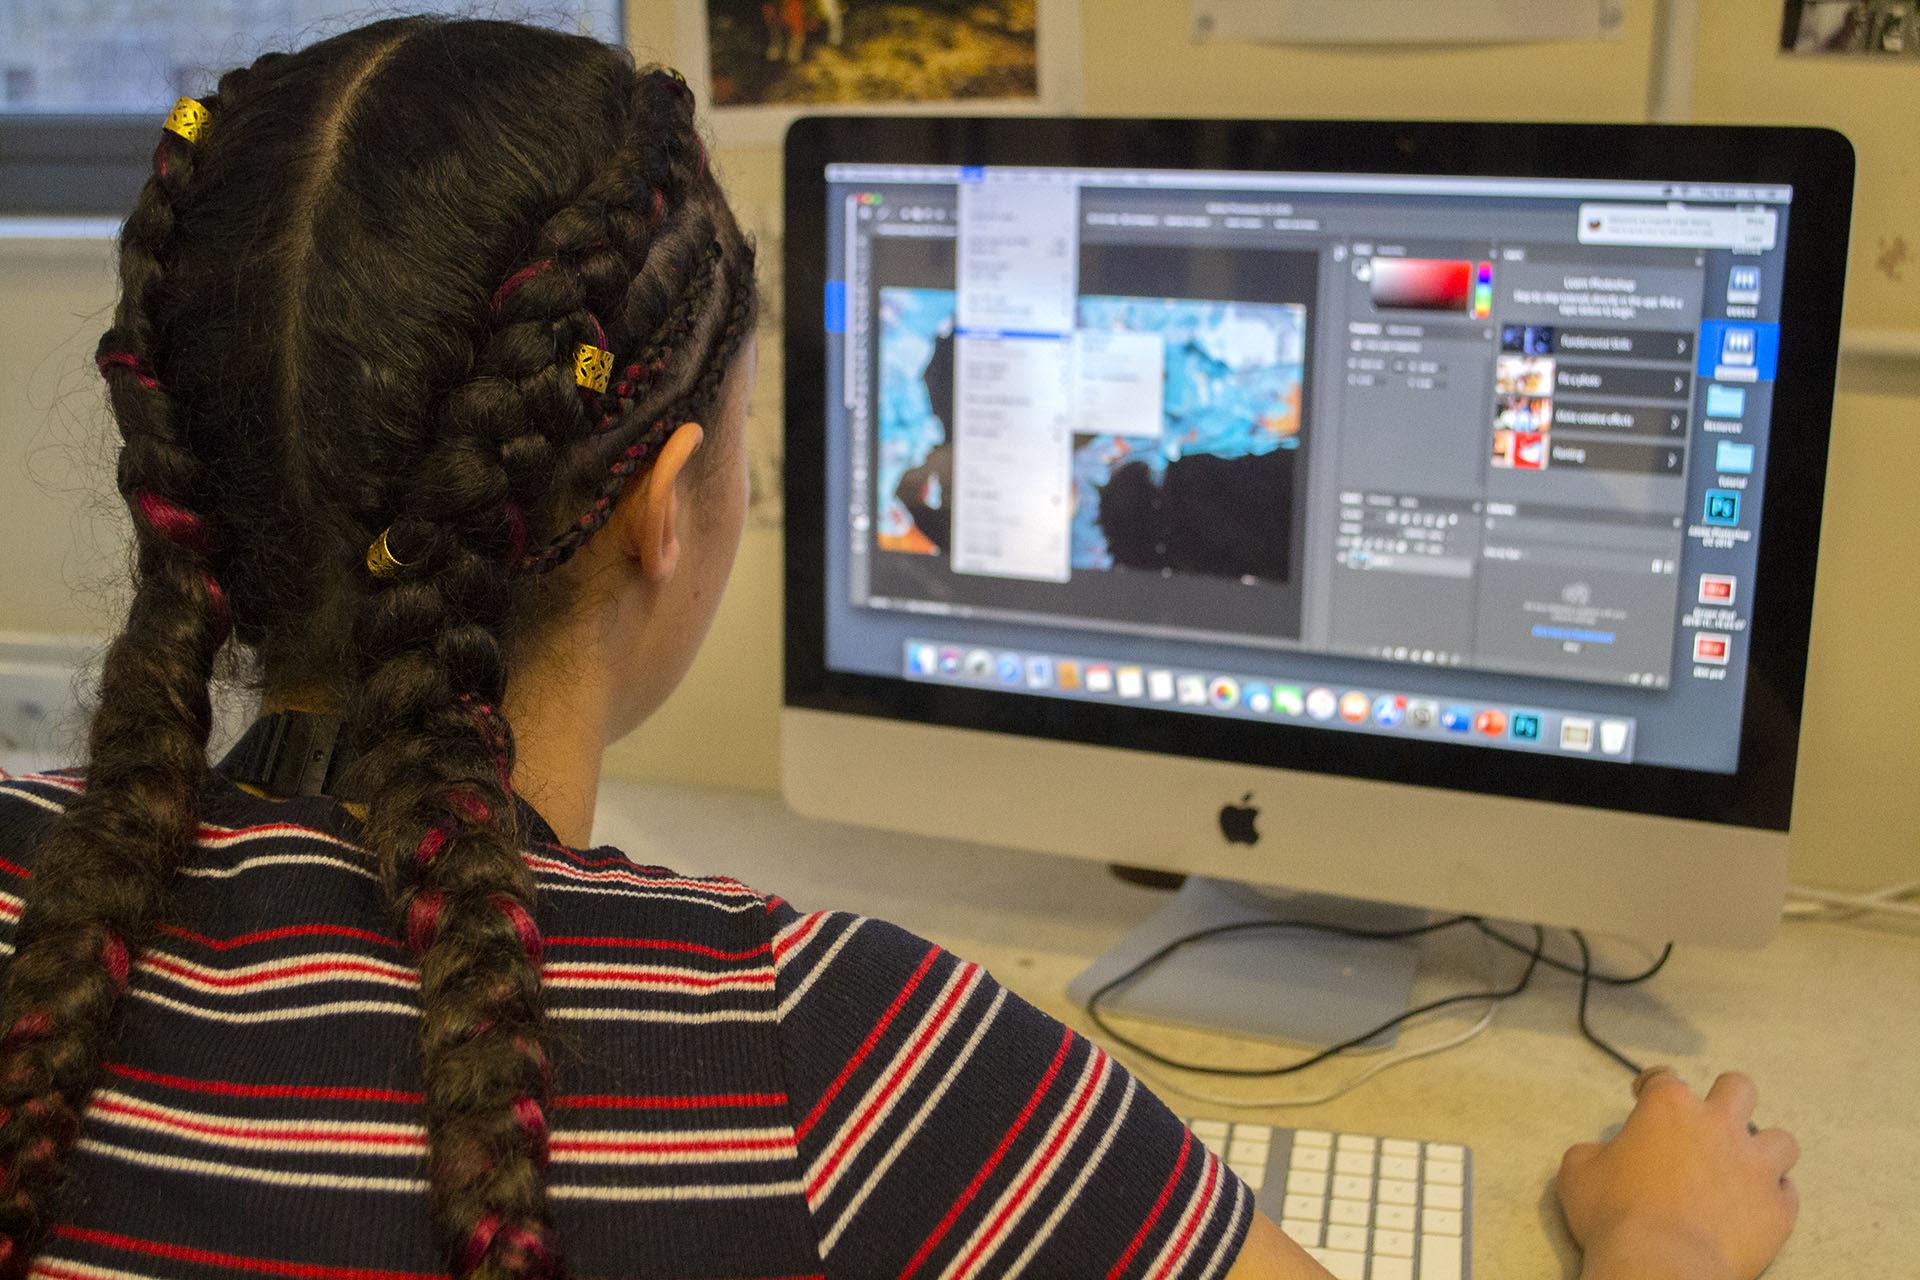 Graphic Design - Student using photoshop